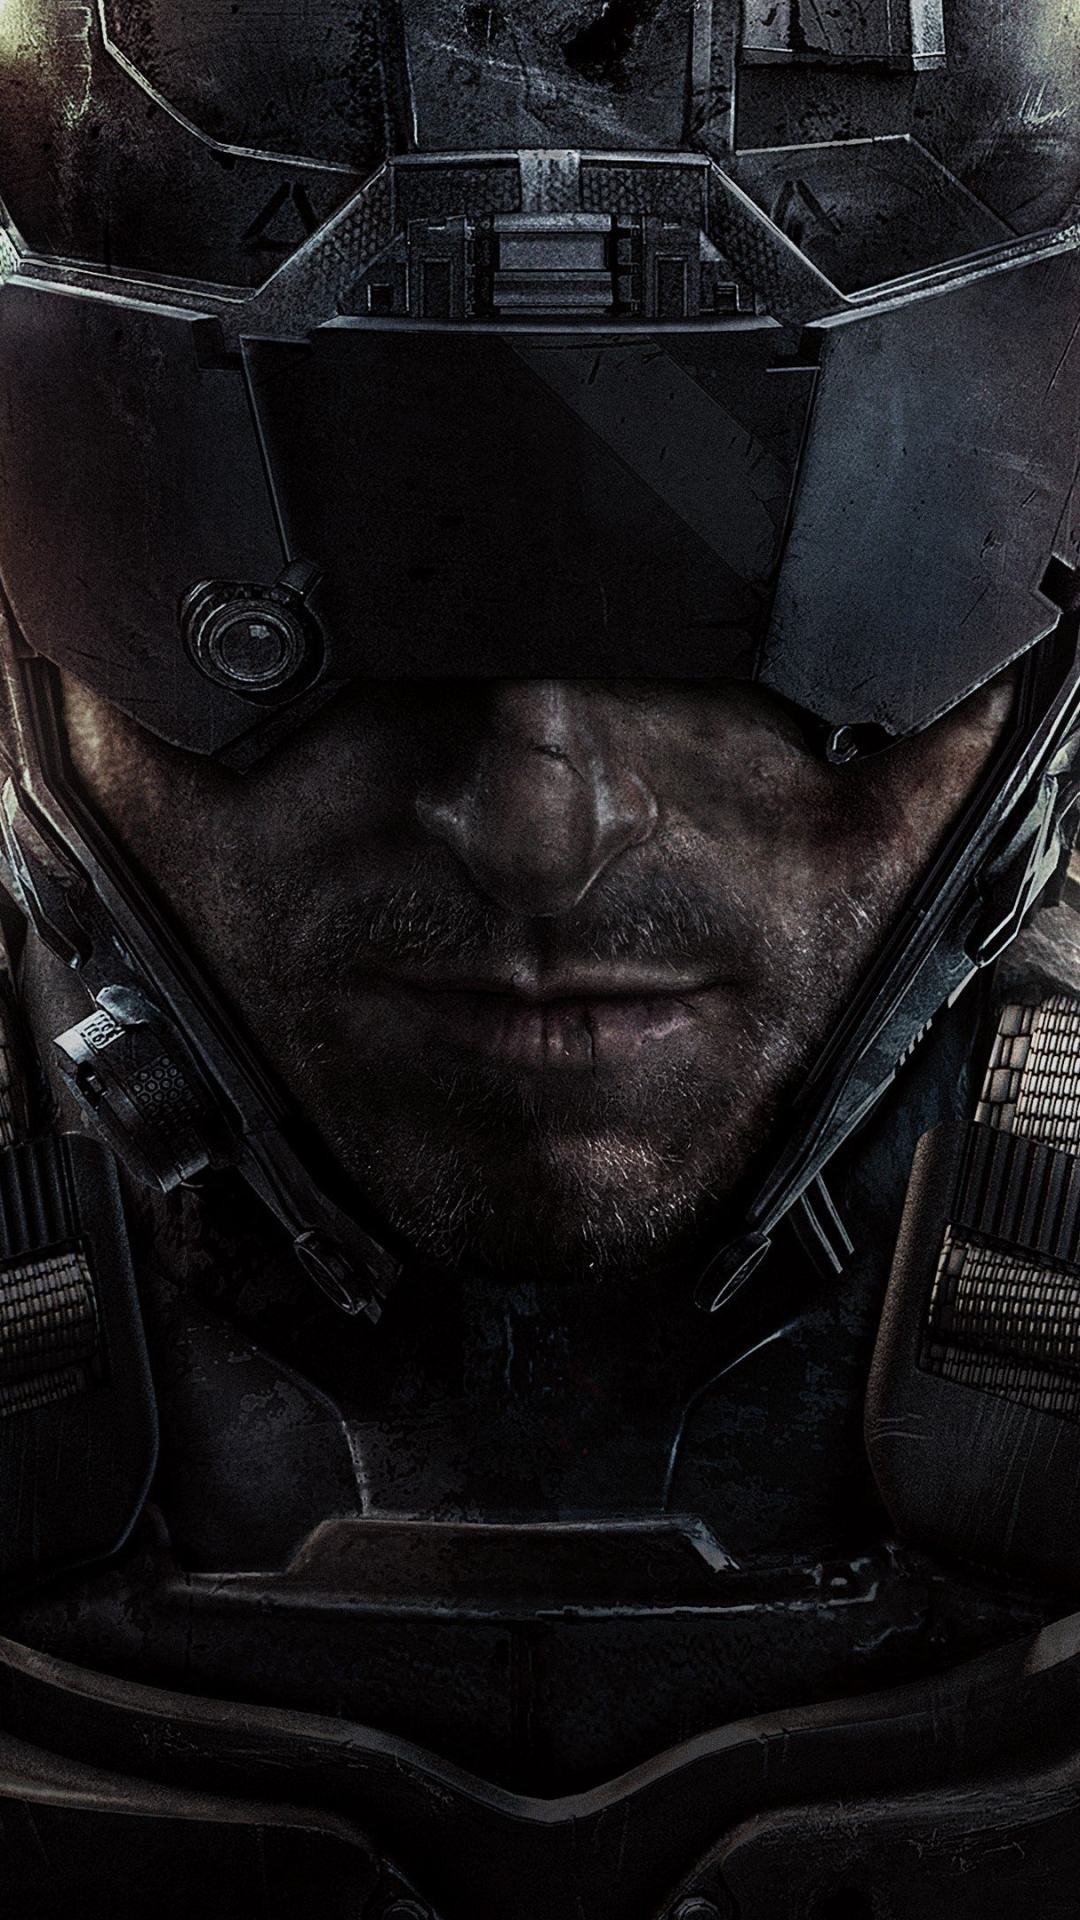 Video Game Call Of Duty Black Ops Iii 1080x1920 Wallpaper Id